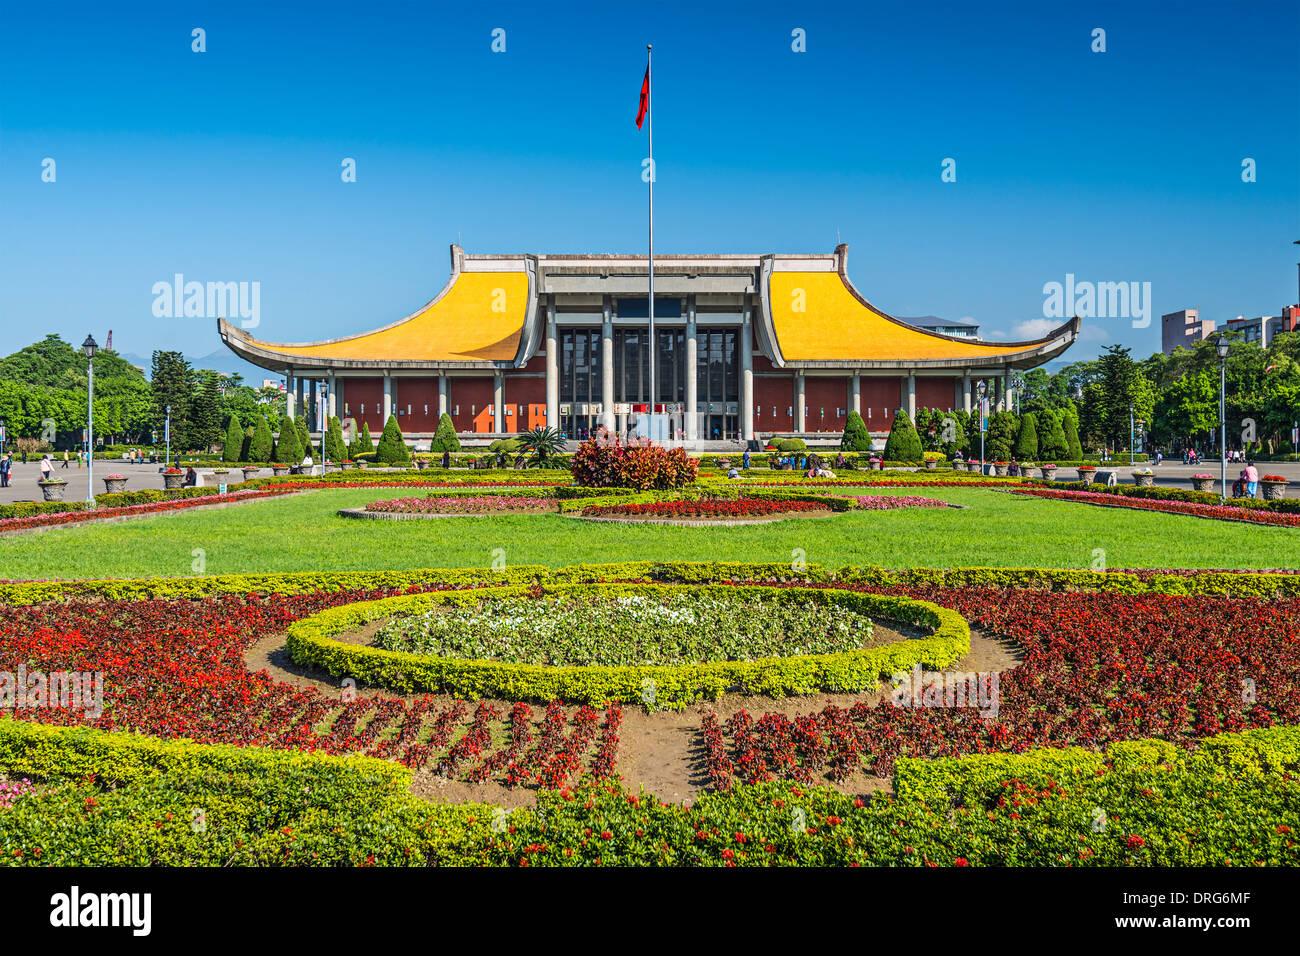 Taipei, Taiwán al Dr. Sun Yat-sen Memorial Hall Gardens. Imagen De Stock